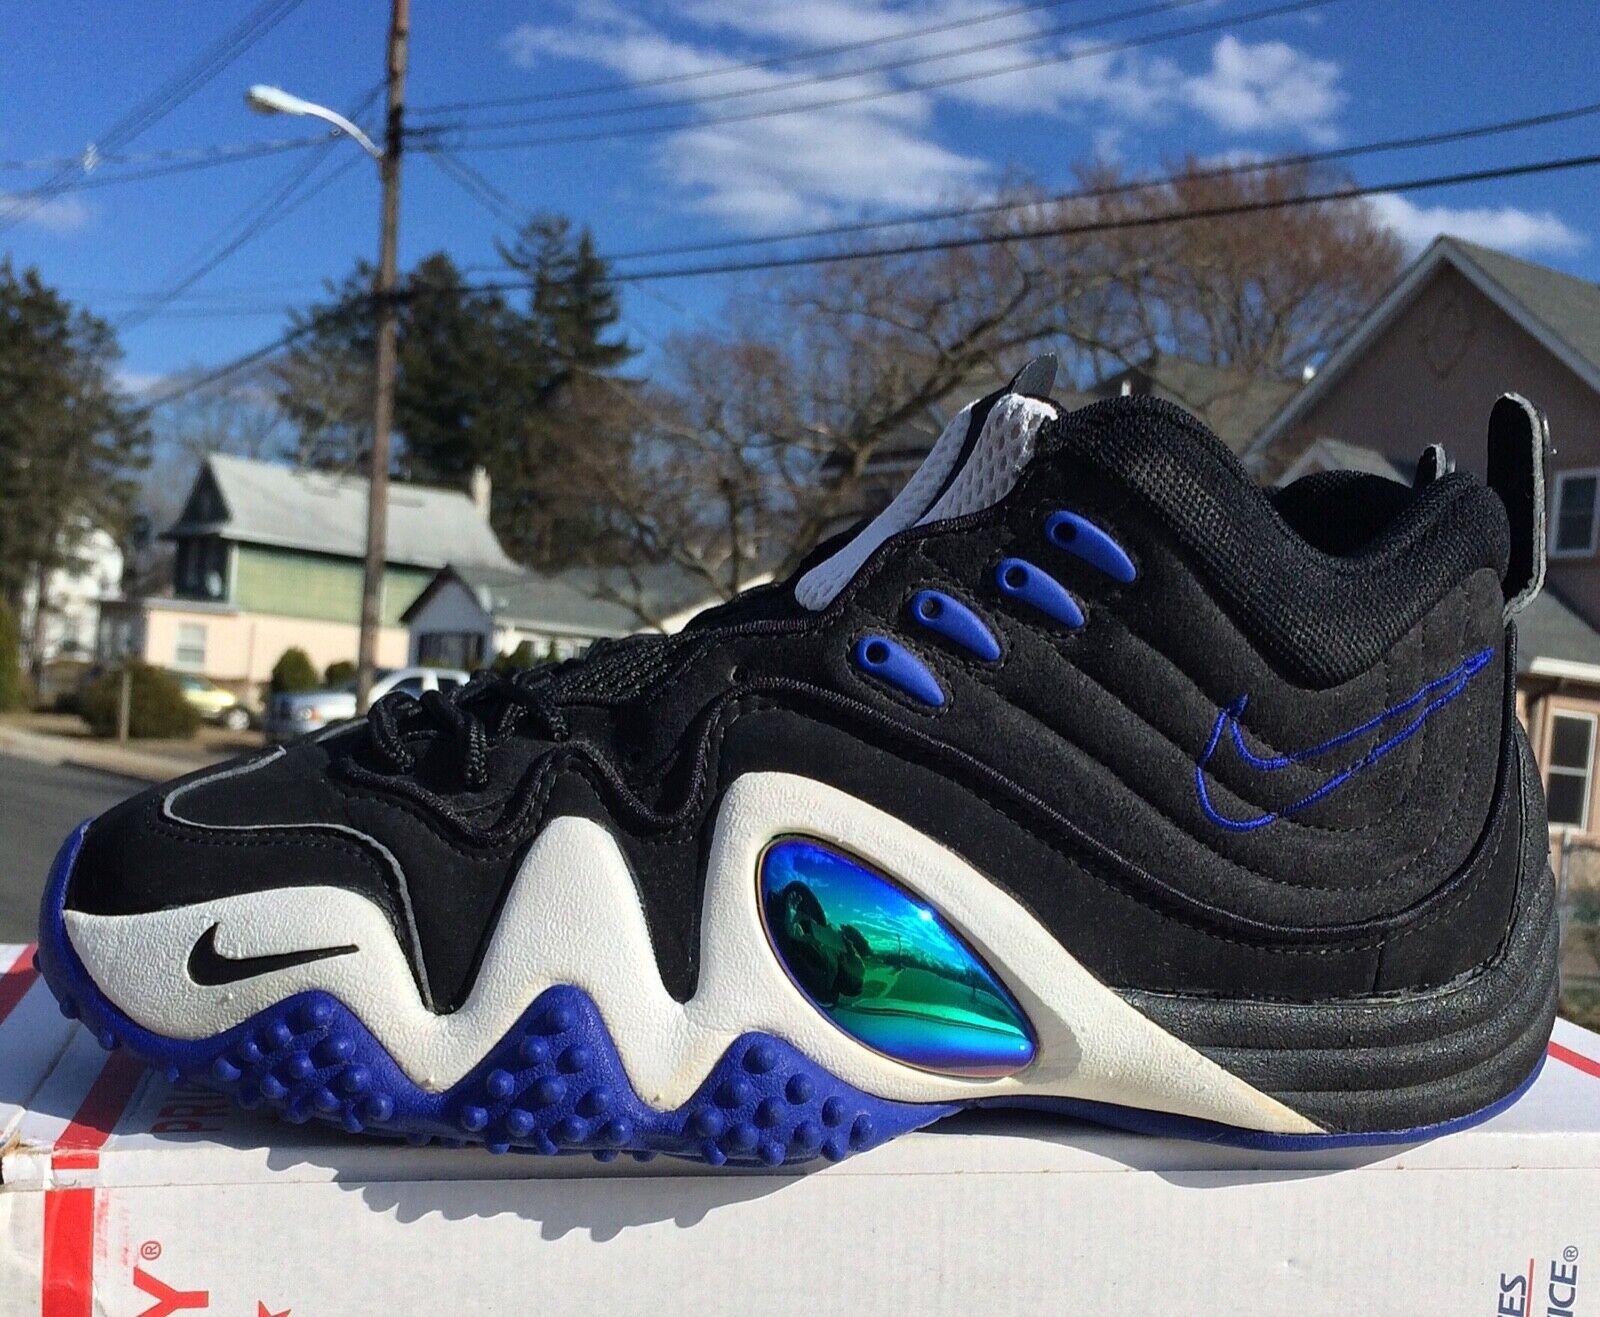 1997 Og Nike Air Zoom Flight Five V Jason Kidd 130701-041 uptempo force Max